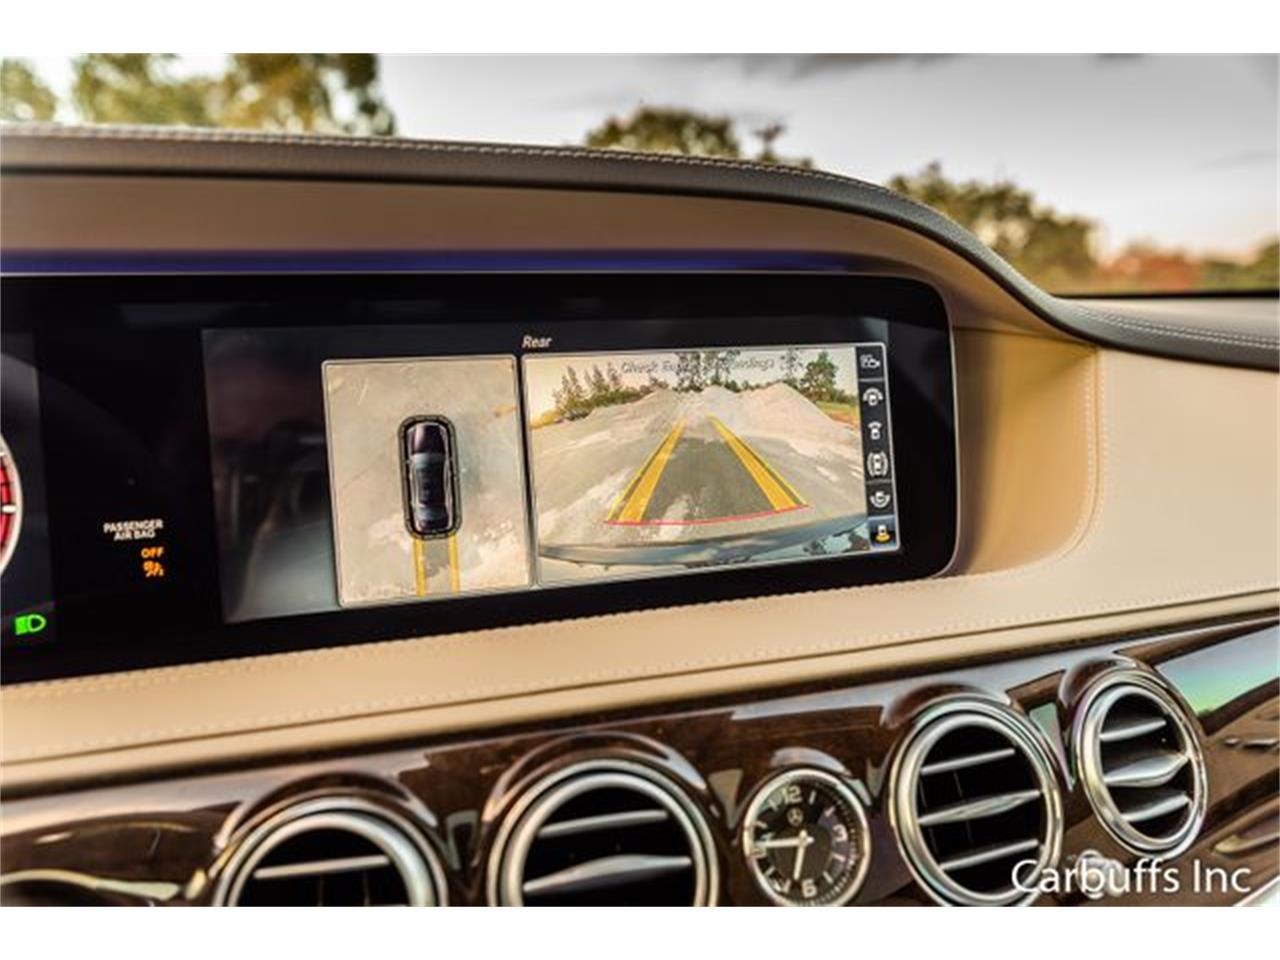 2018 Mercedes-Benz S-Class (CC-1392523) for sale in Concord, California